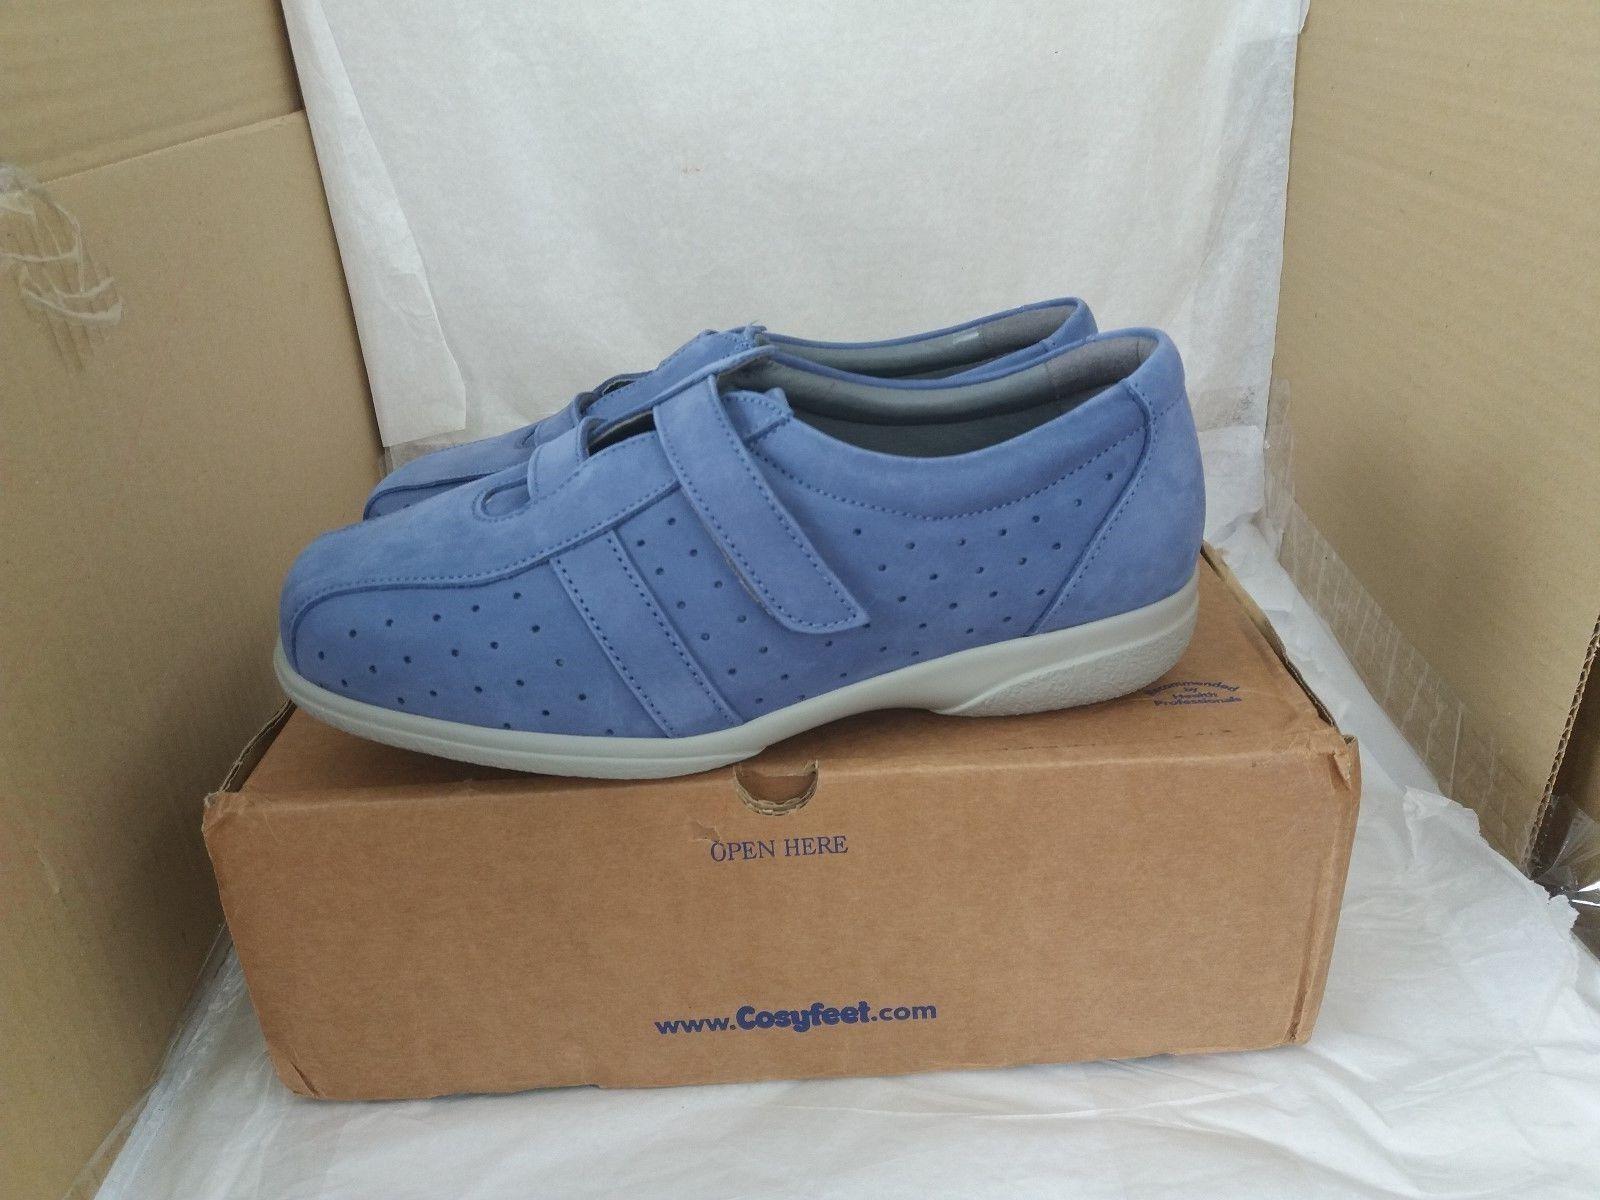 Cosyfeet  HEAVEN Extra Roomy Footwear - Azure Größe - UK Größe Azure 5/EU 38 - 6b4a6f